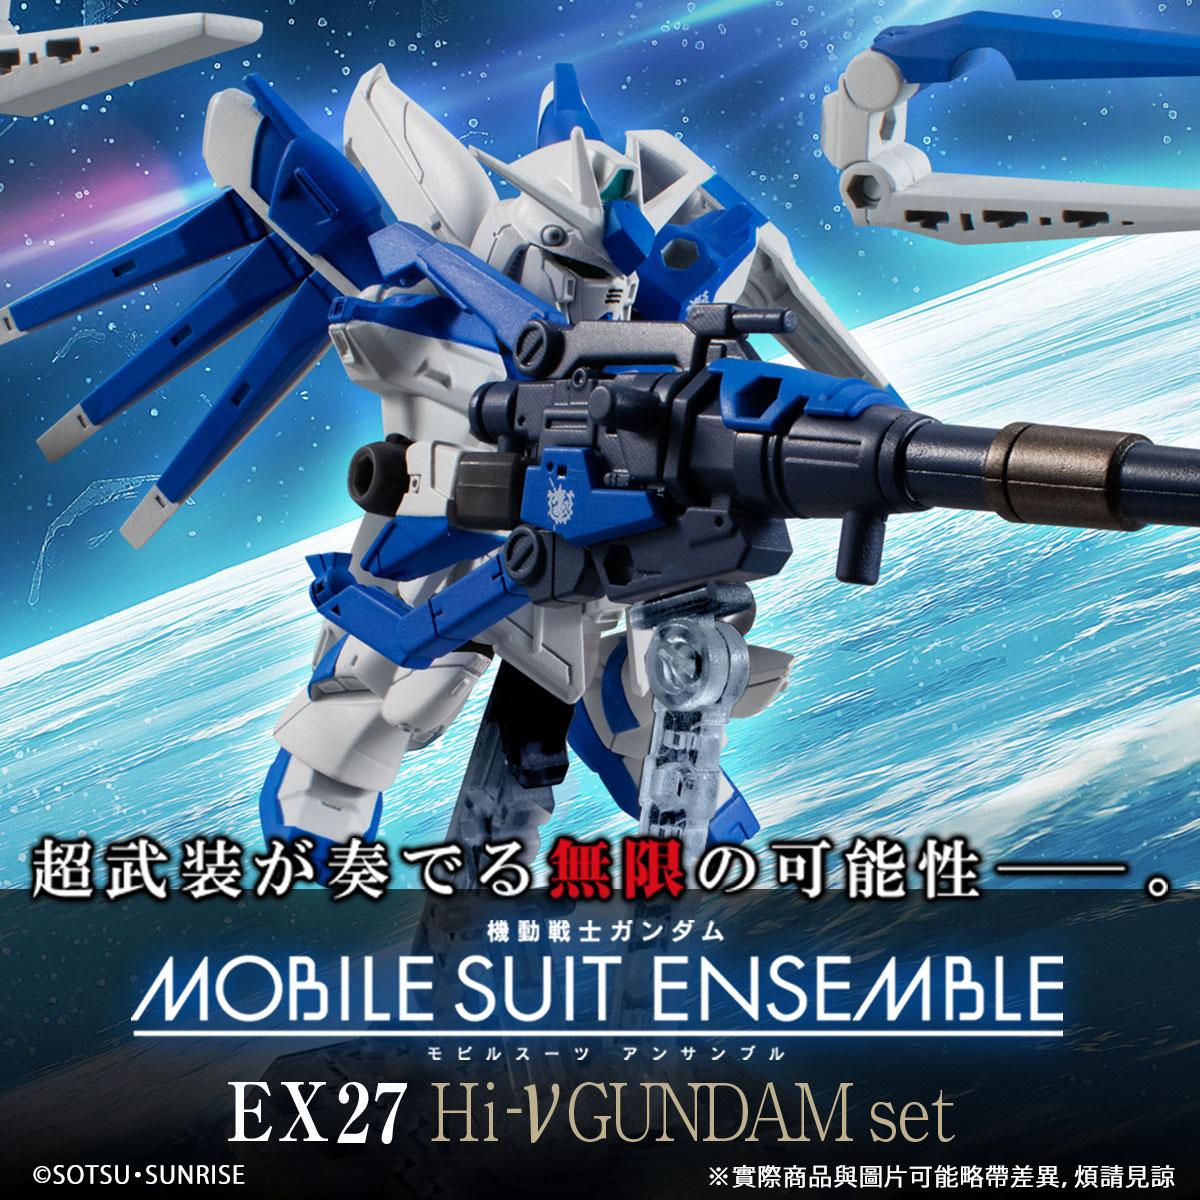 MOBILE SUIT ENSEMBLE EX27 Hi-v GUNDAM SET